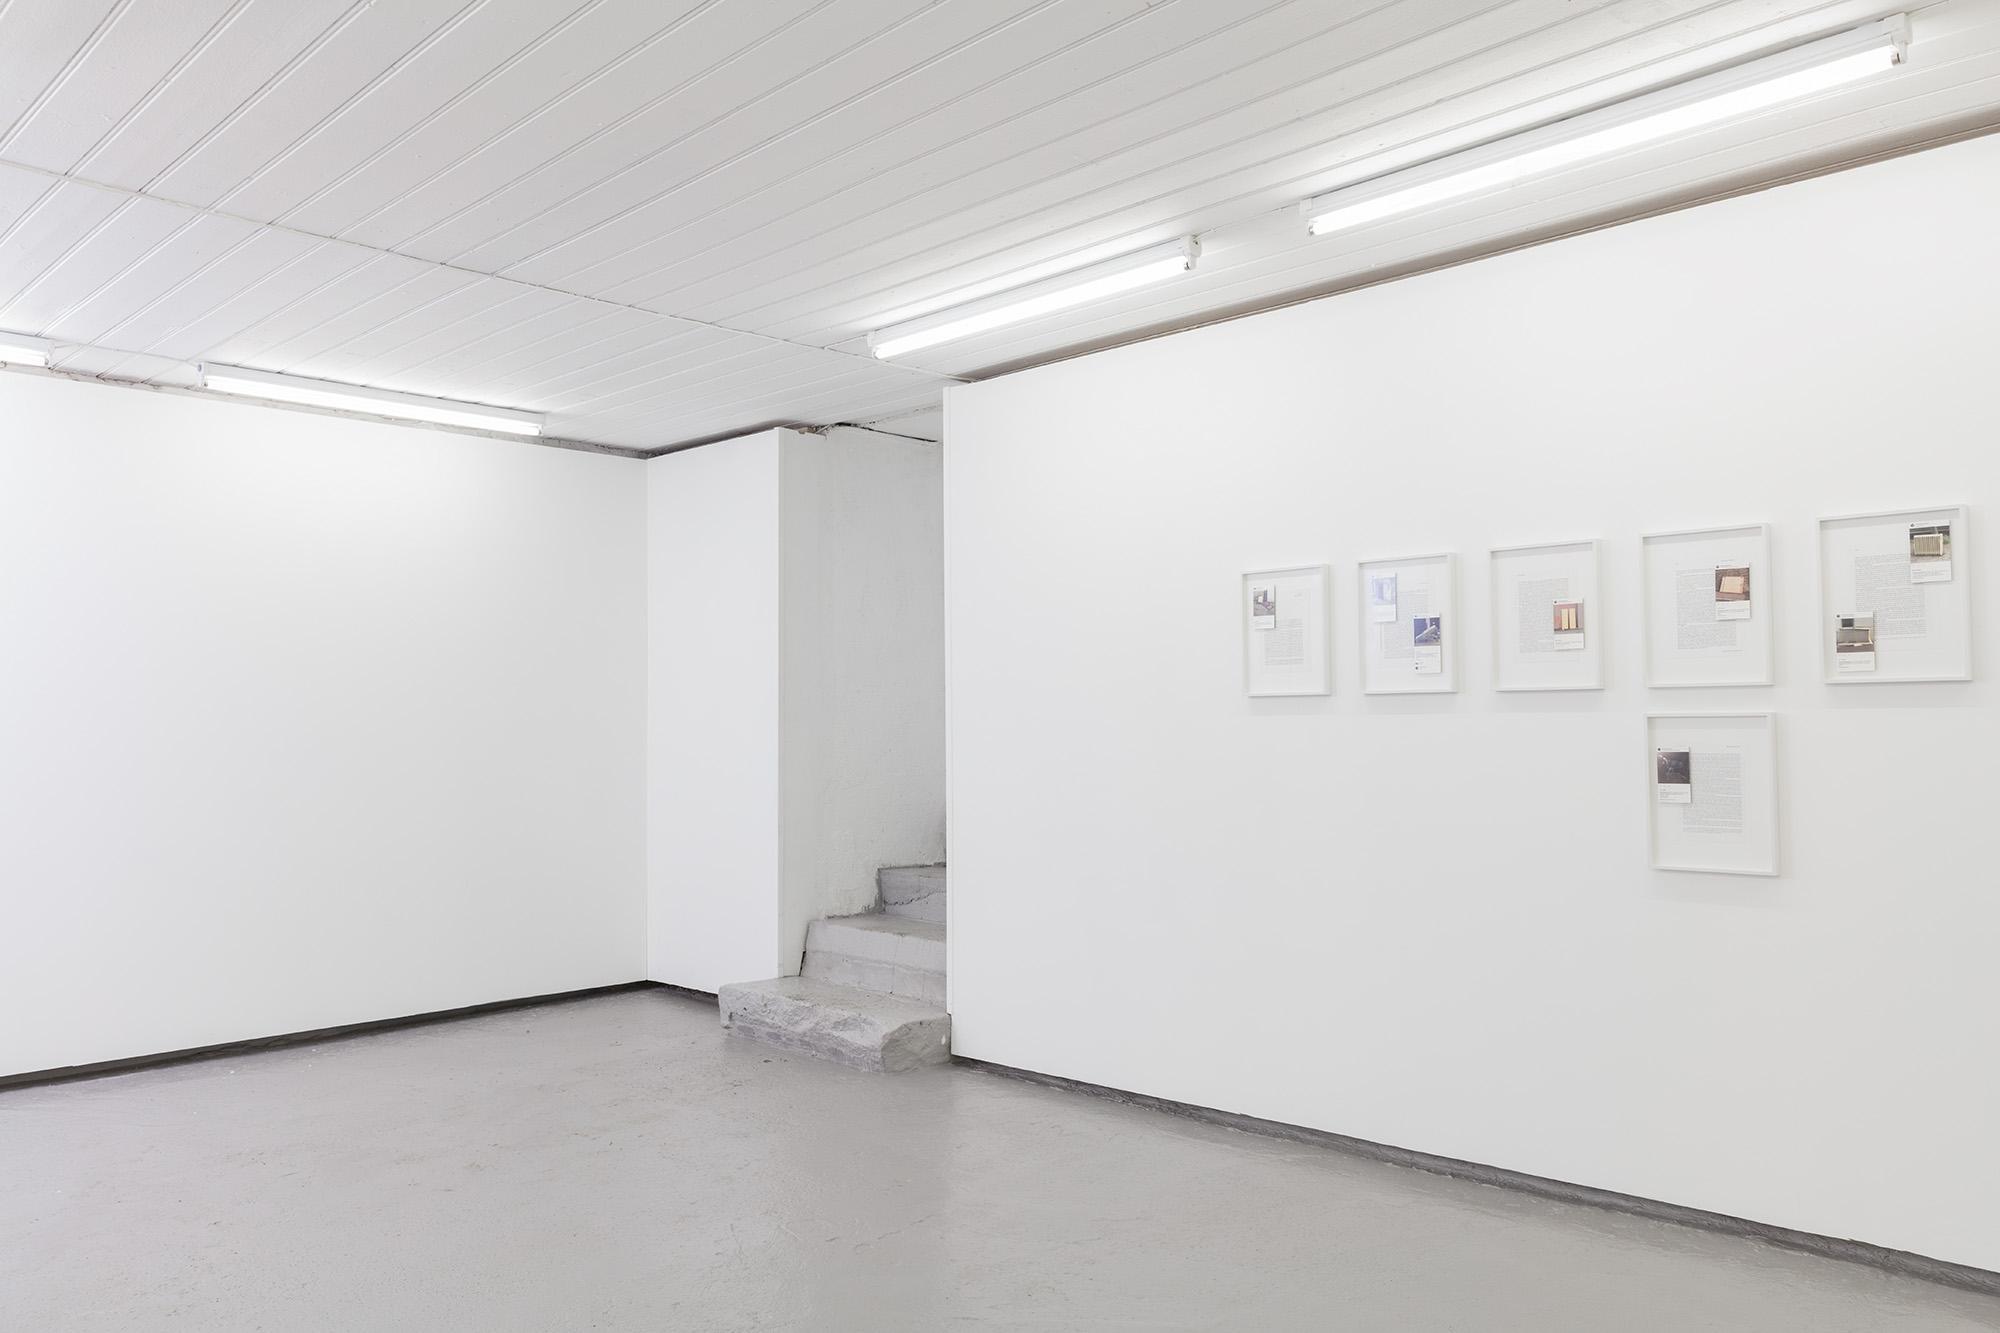 Sveinn Fannar Jóhannsson - Recent Works and Other Myths at MELK 2018